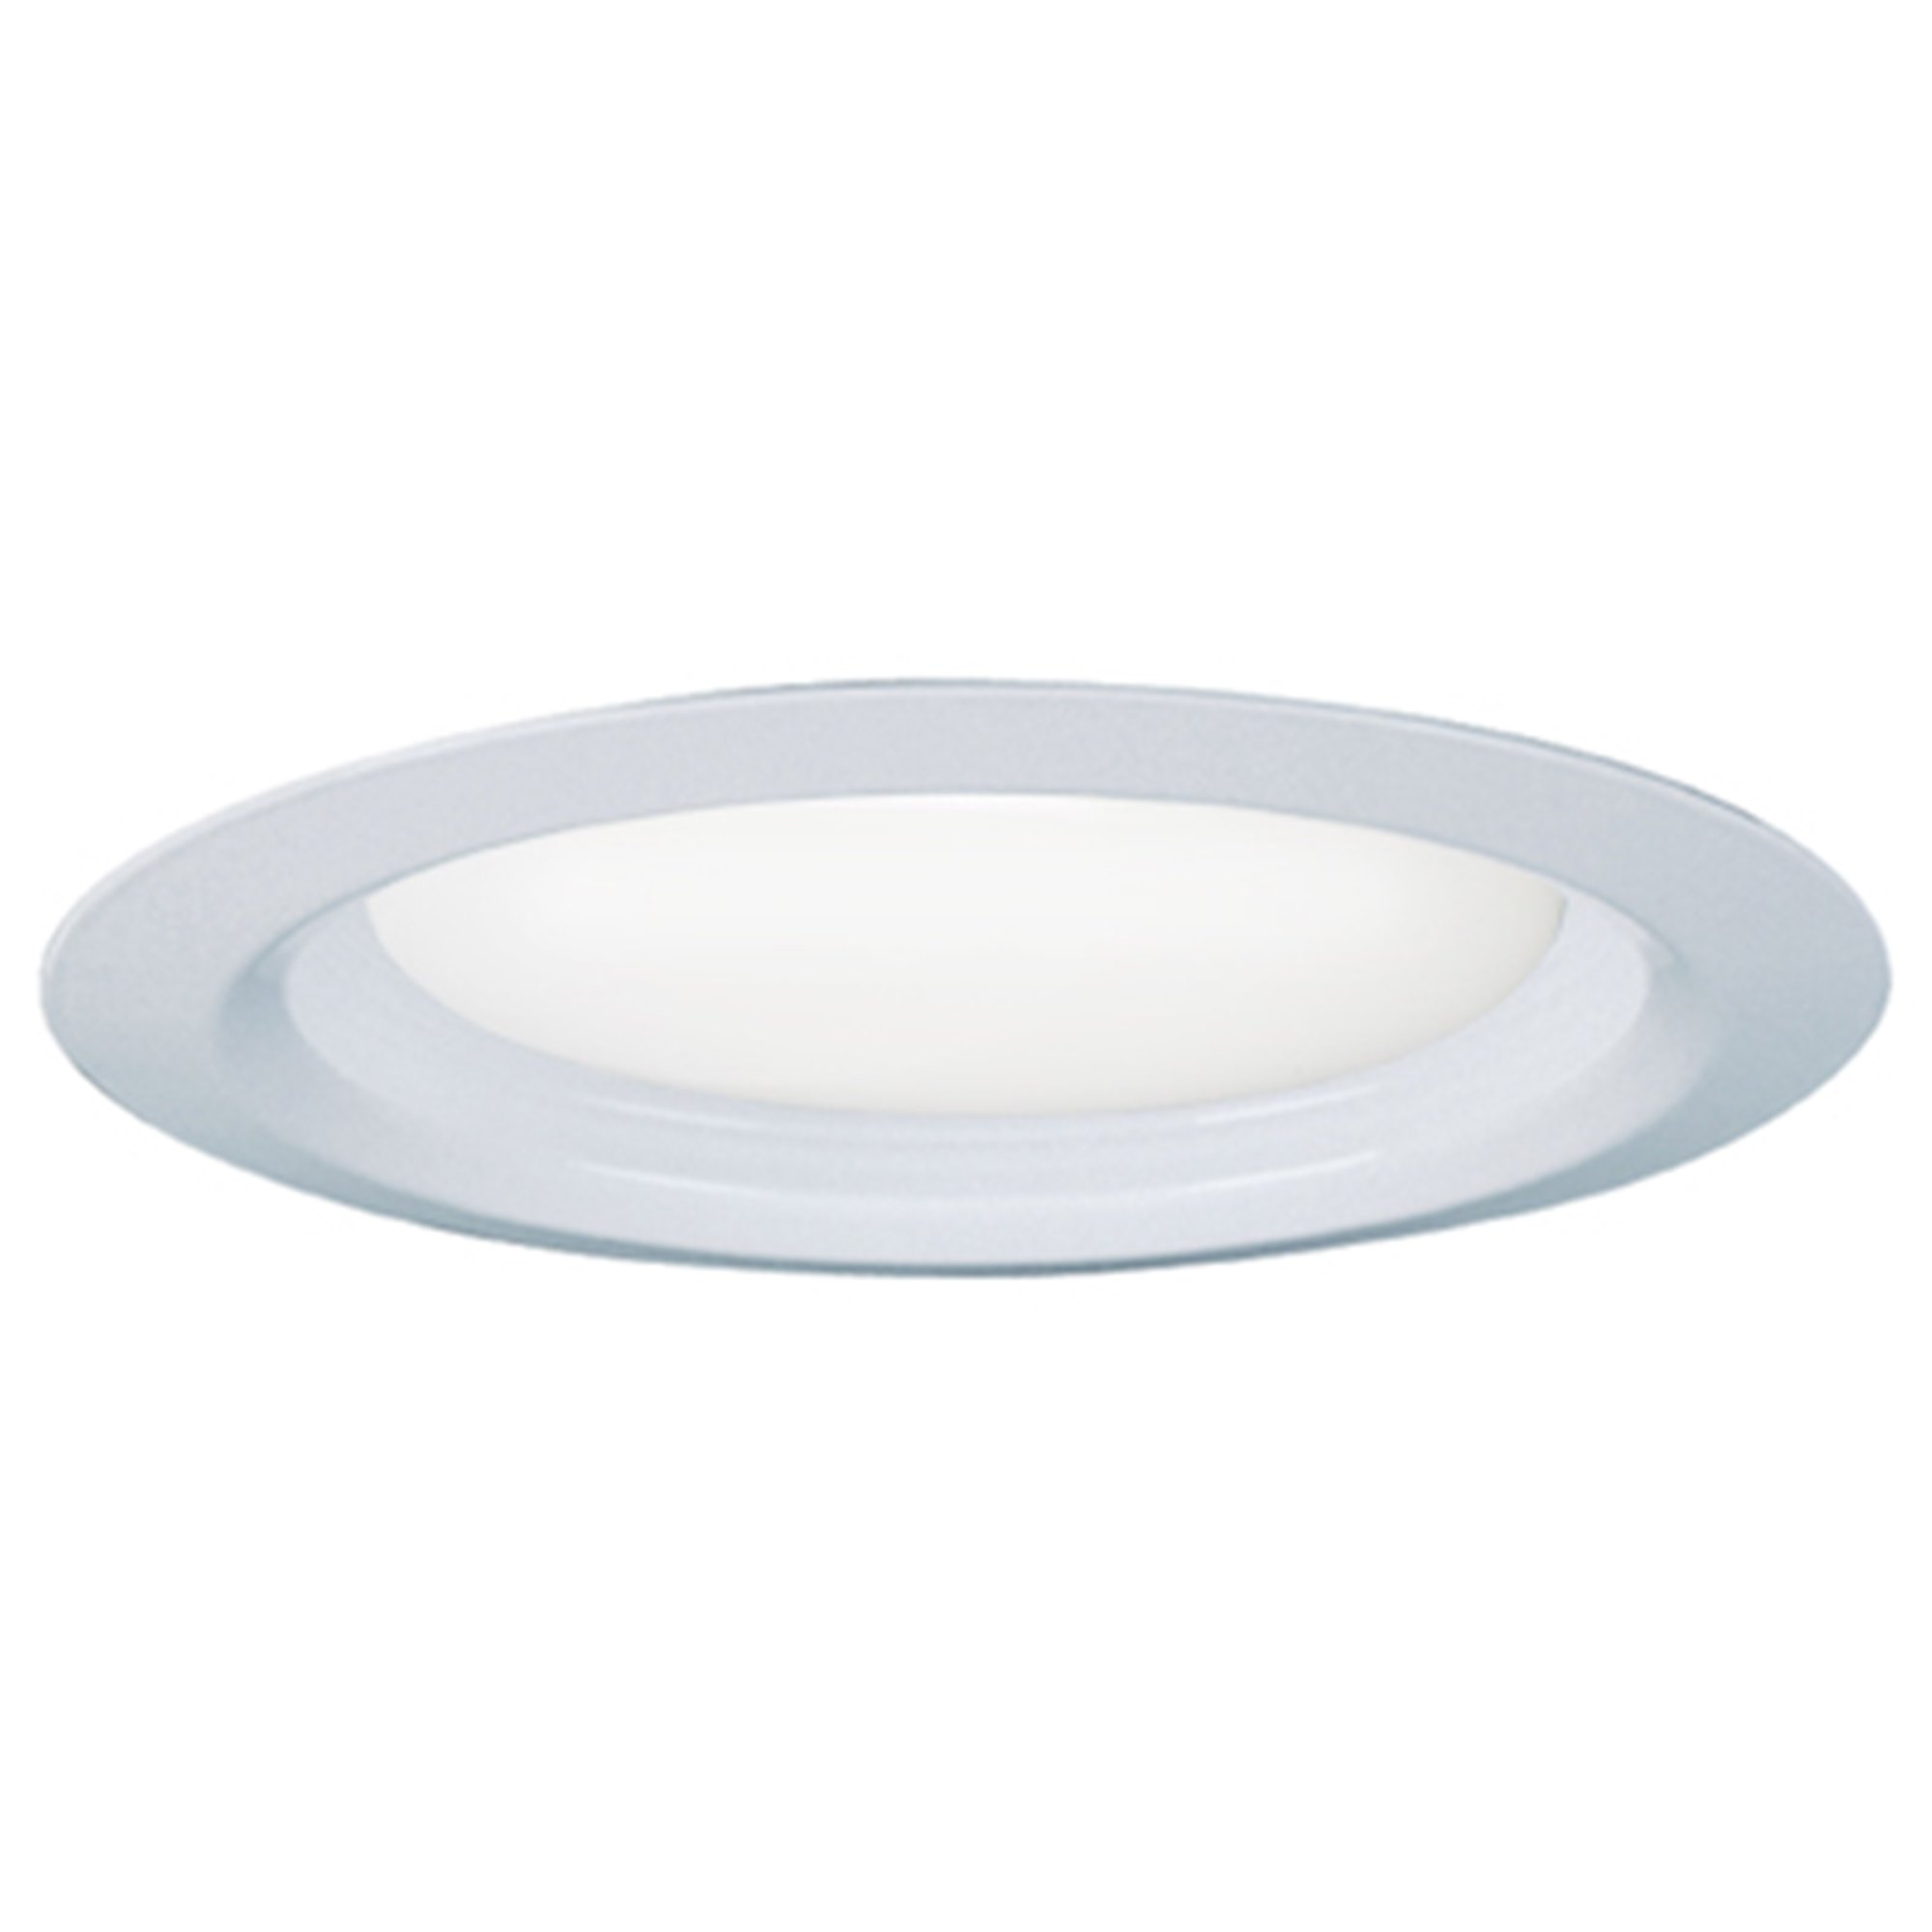 Lithonia Lighting LK3B1MW BR20 LED M6 4-Inch Matte White Recessed Downlighting